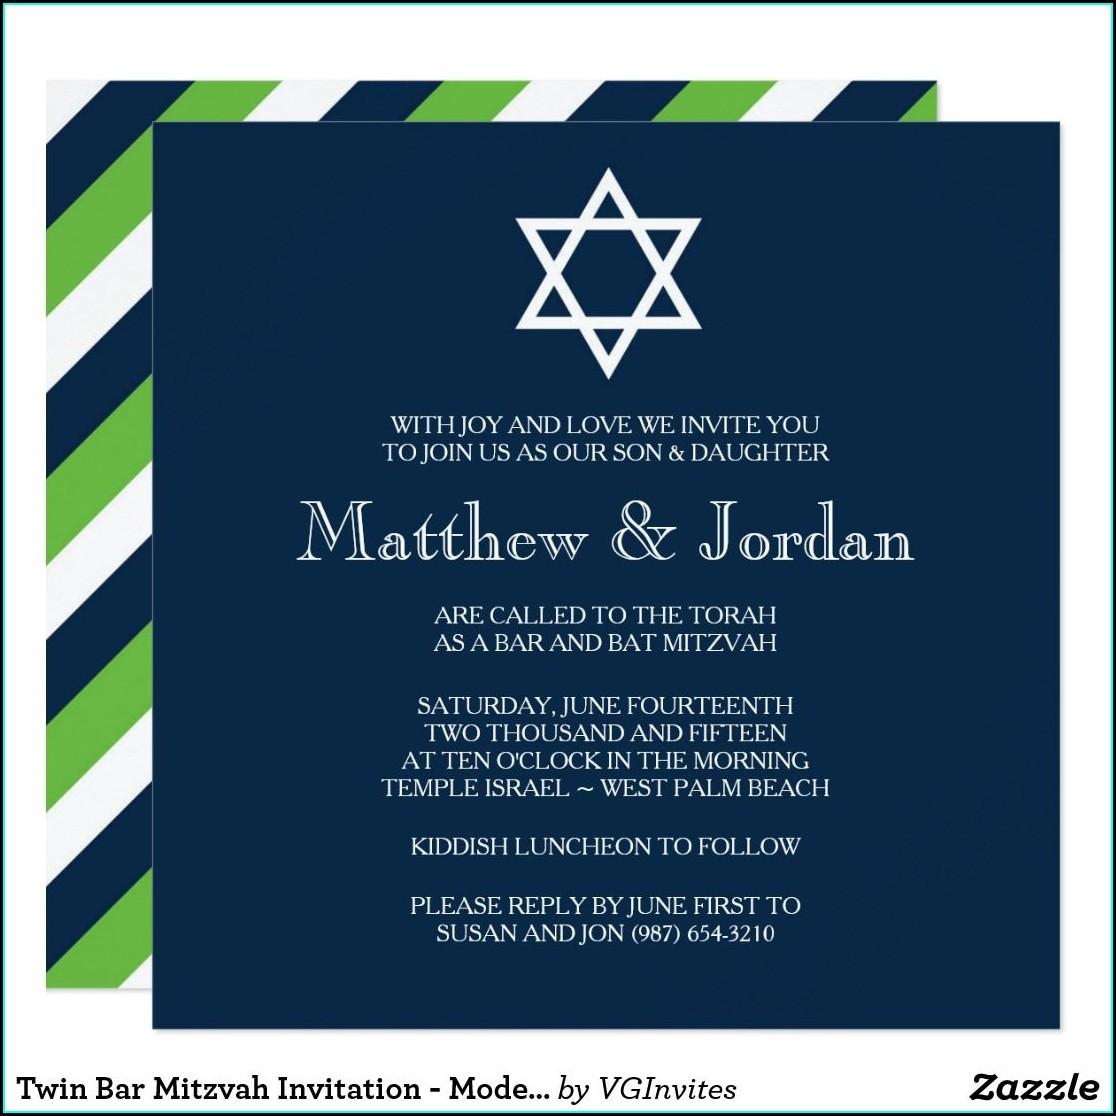 Twin Bar Mitzvah Invitations